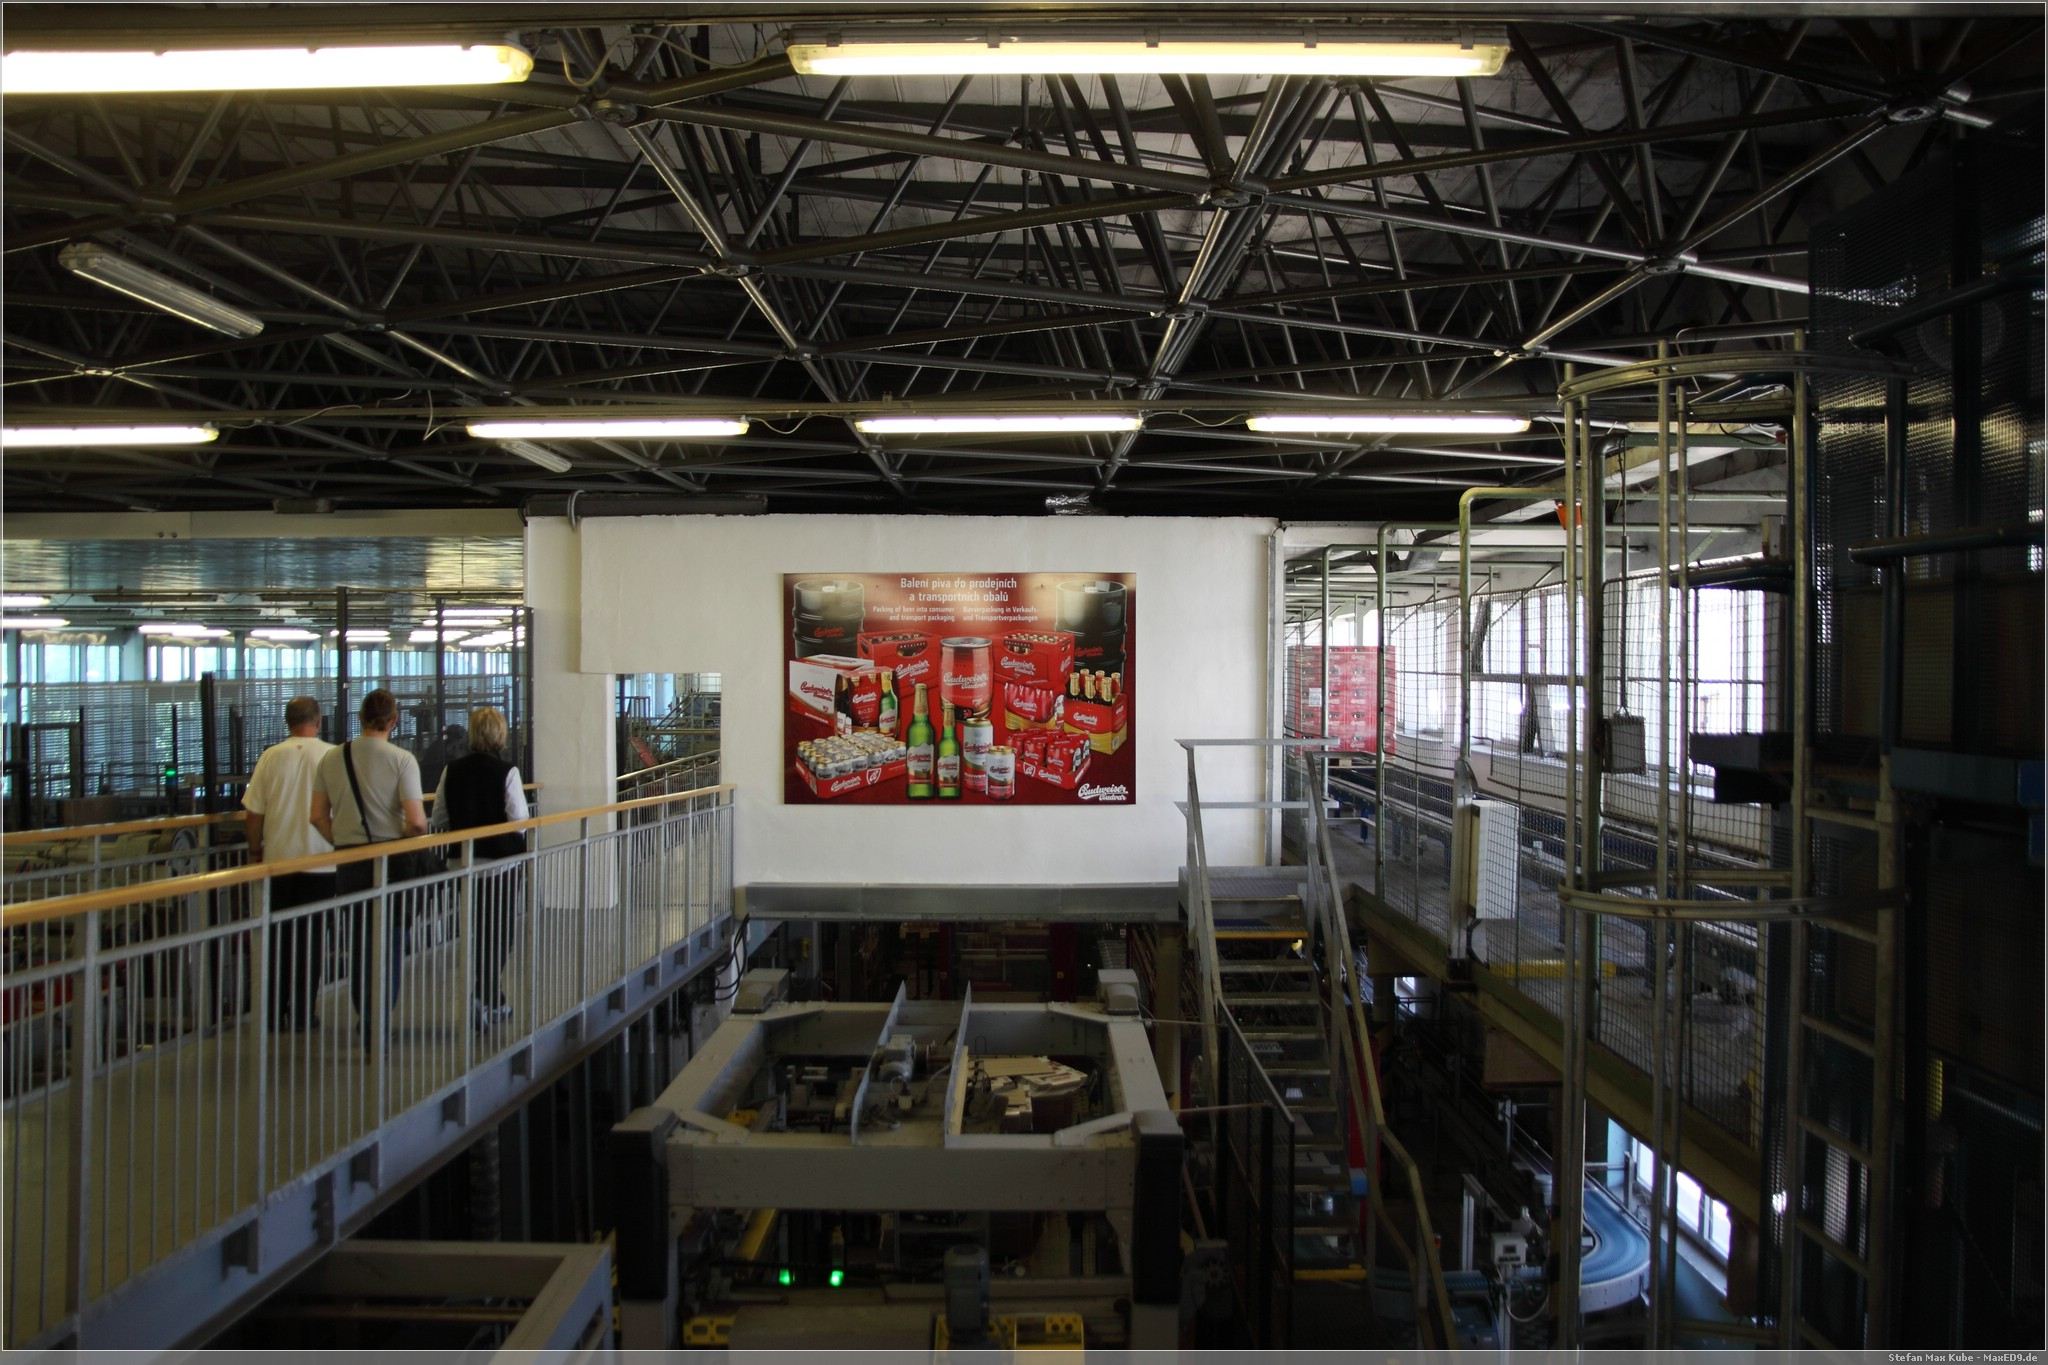 Abfüllung und Verpackung, Budweis Brauerei